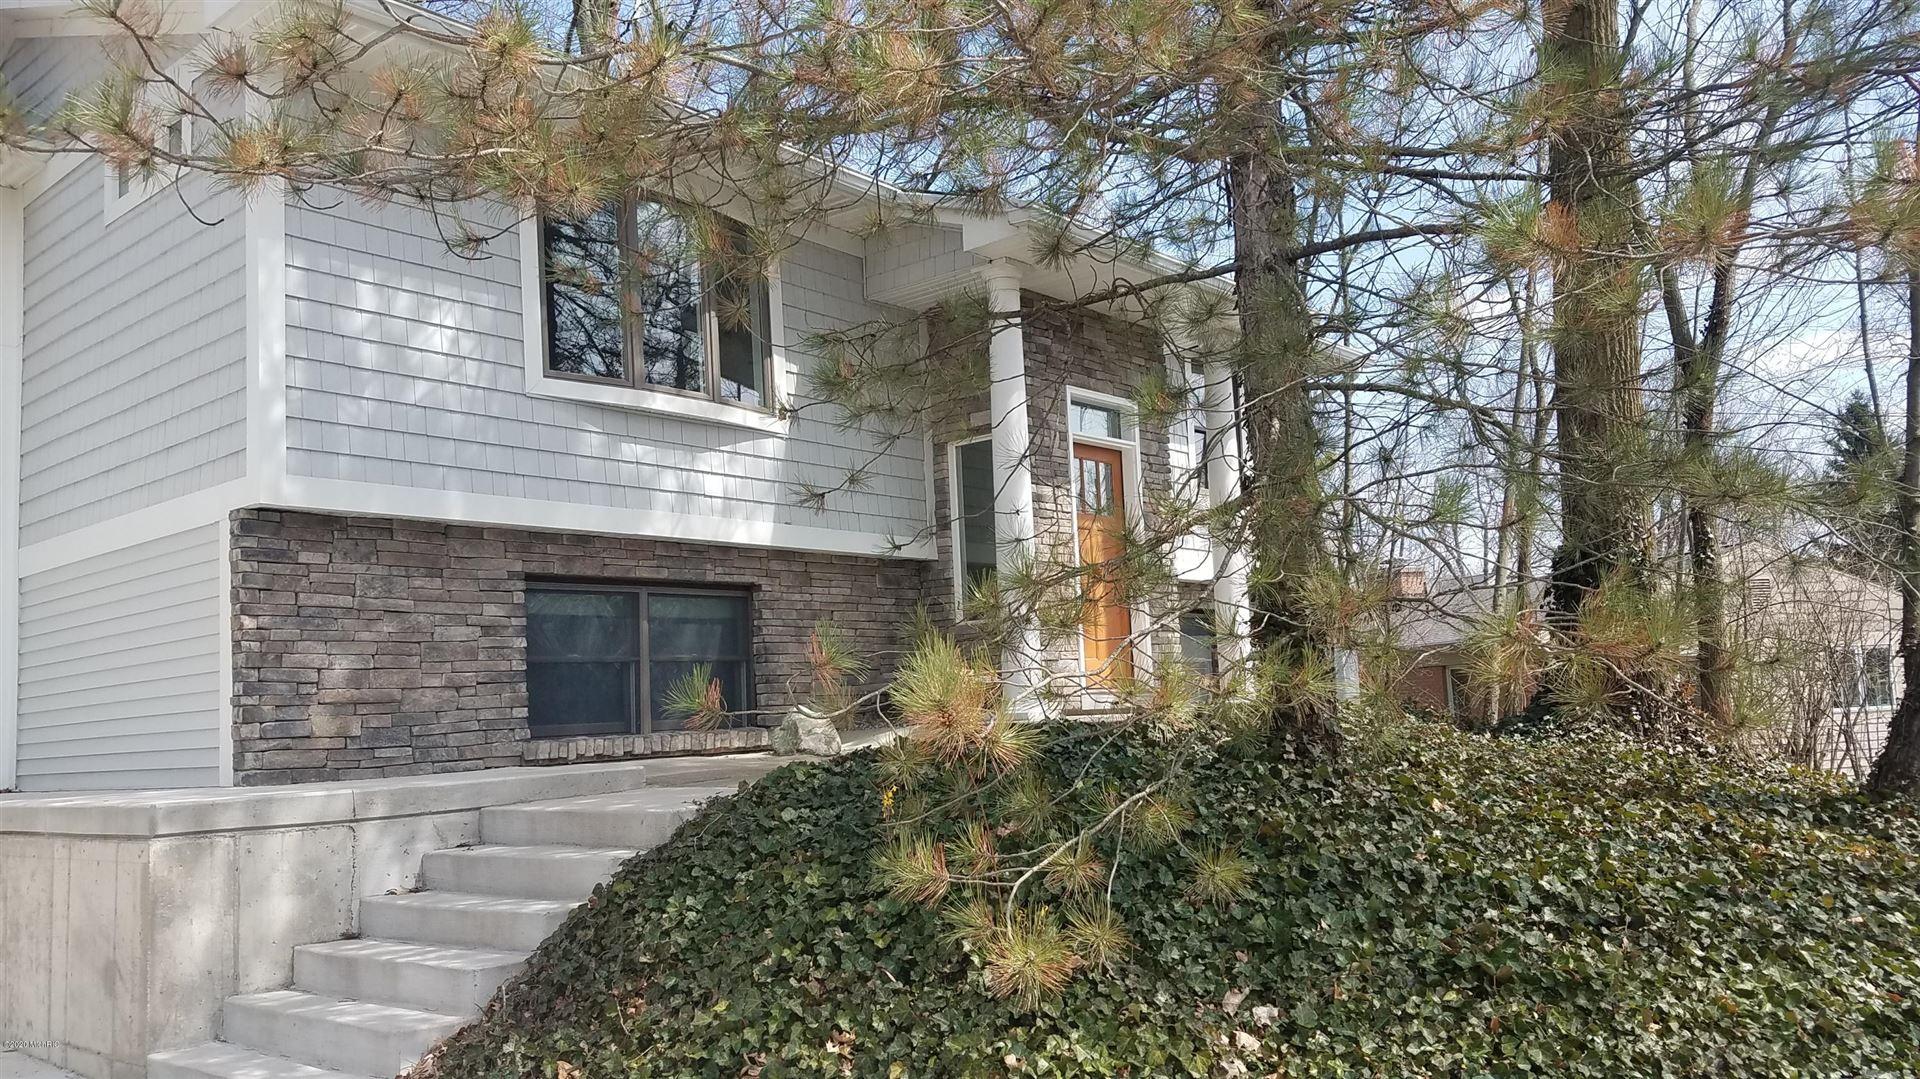 Photo of 3512 McCoy Avenue SE, Grand Rapids, MI 49506 (MLS # 20032071)